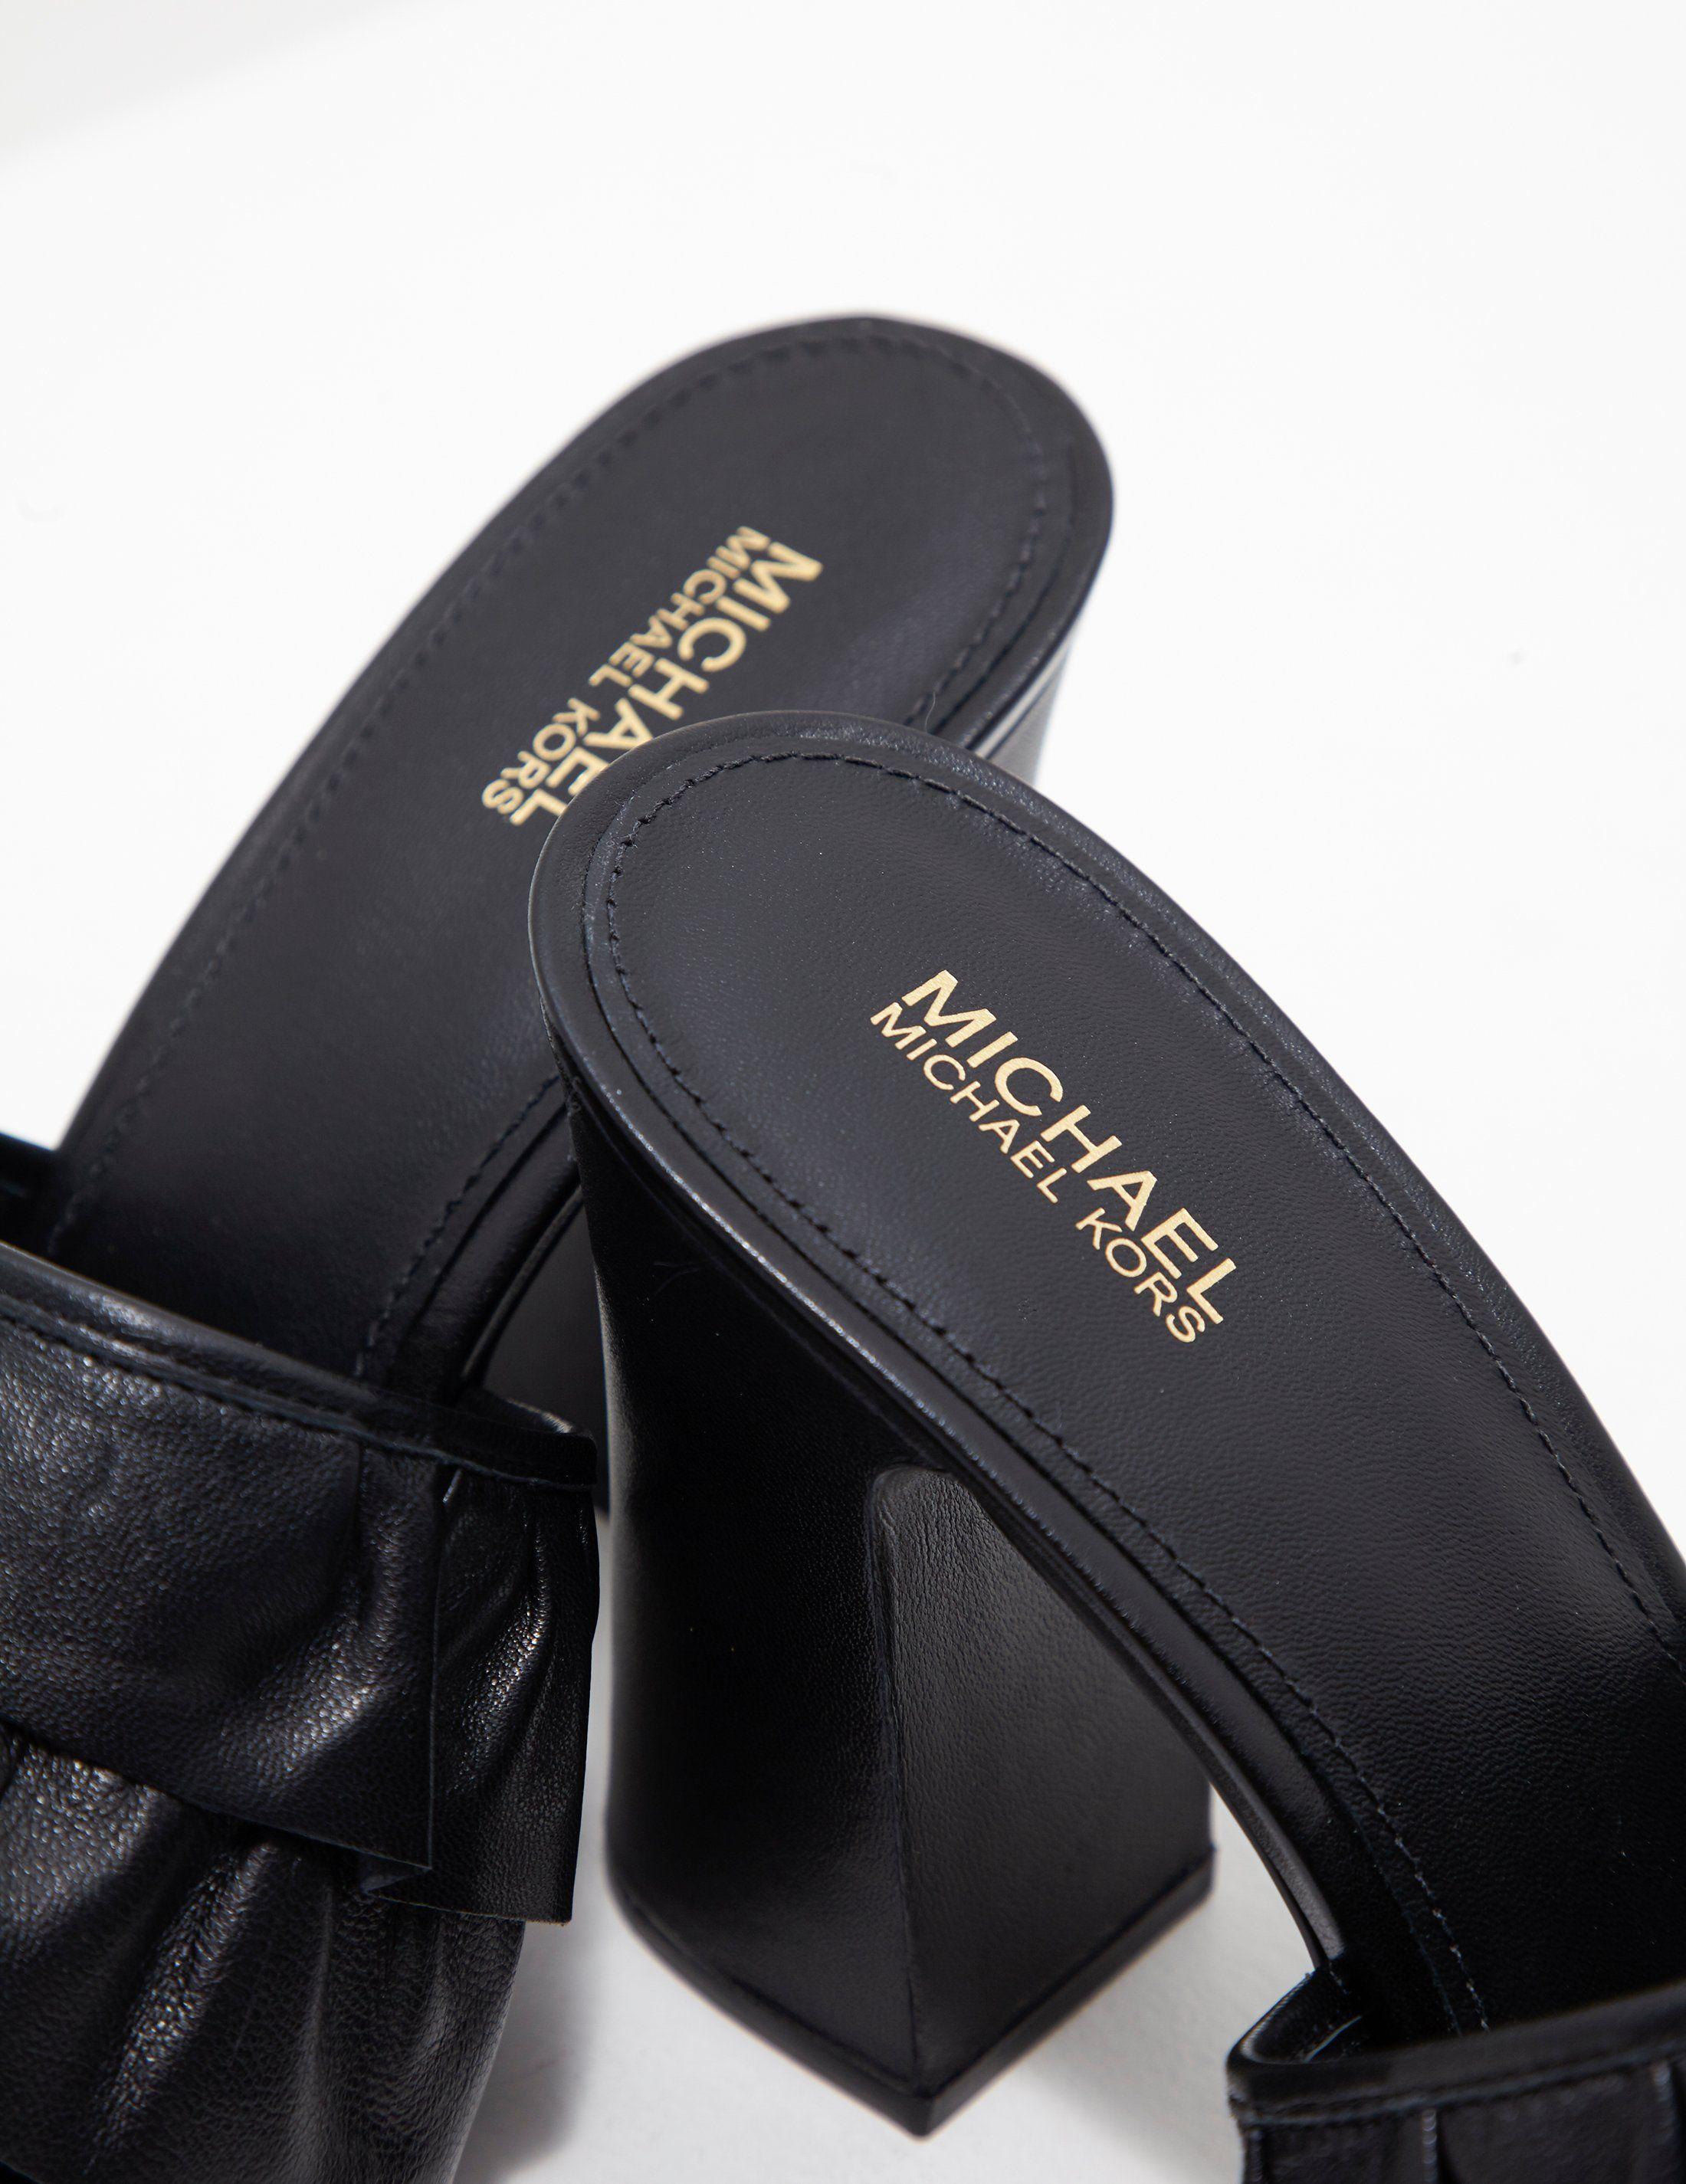 Michael Kors Bella Mule Heels - Online Exclusive